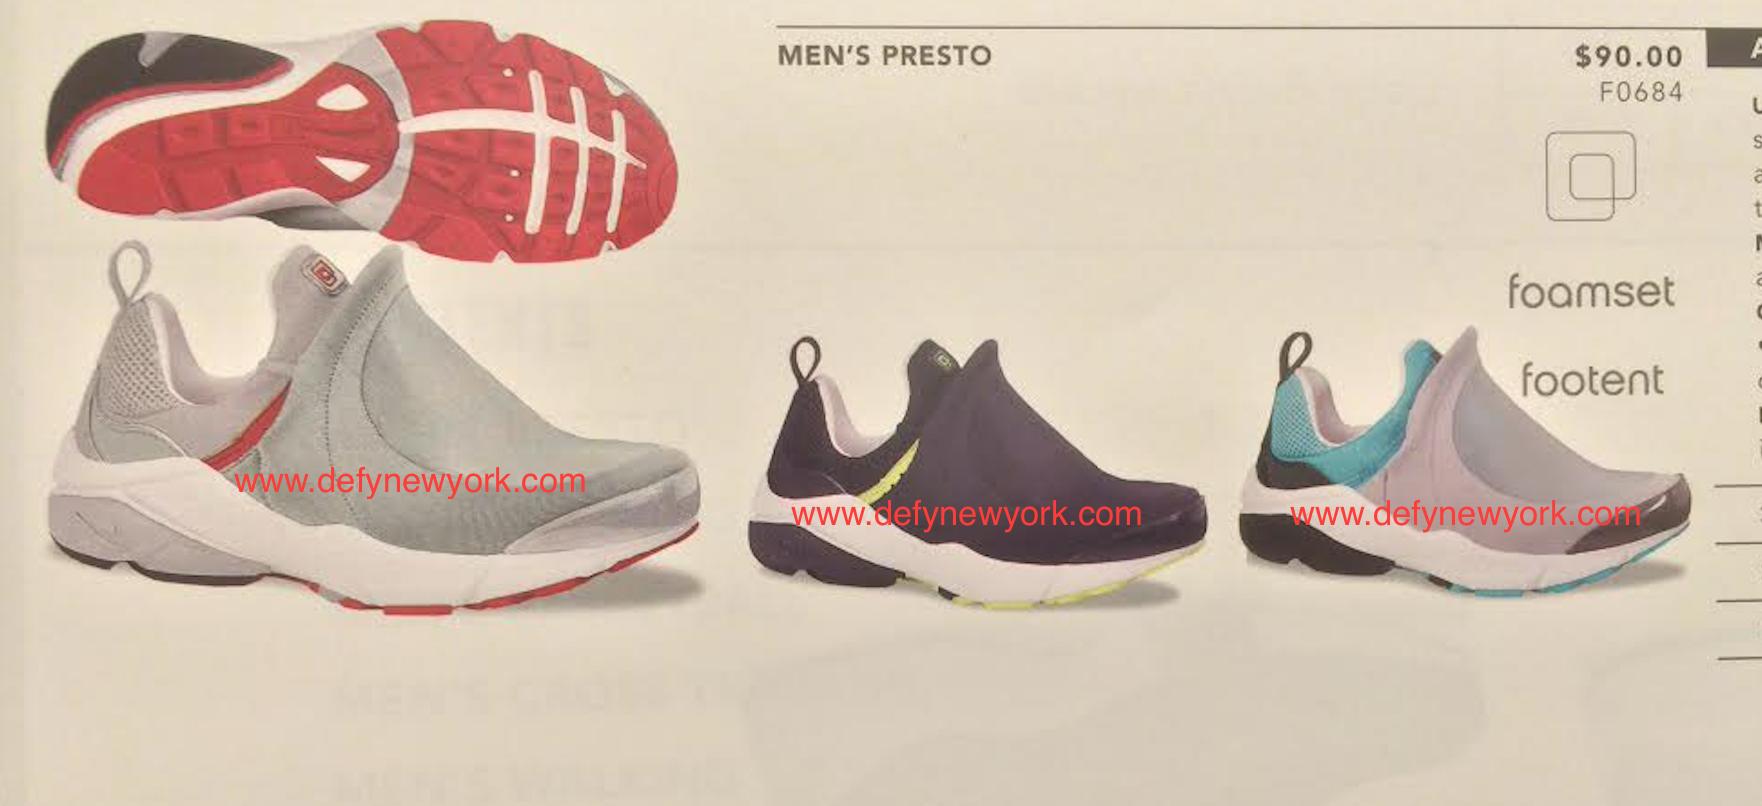 Nike Air Presto Footent 2002 : New York Sneakers,Music,Fashion